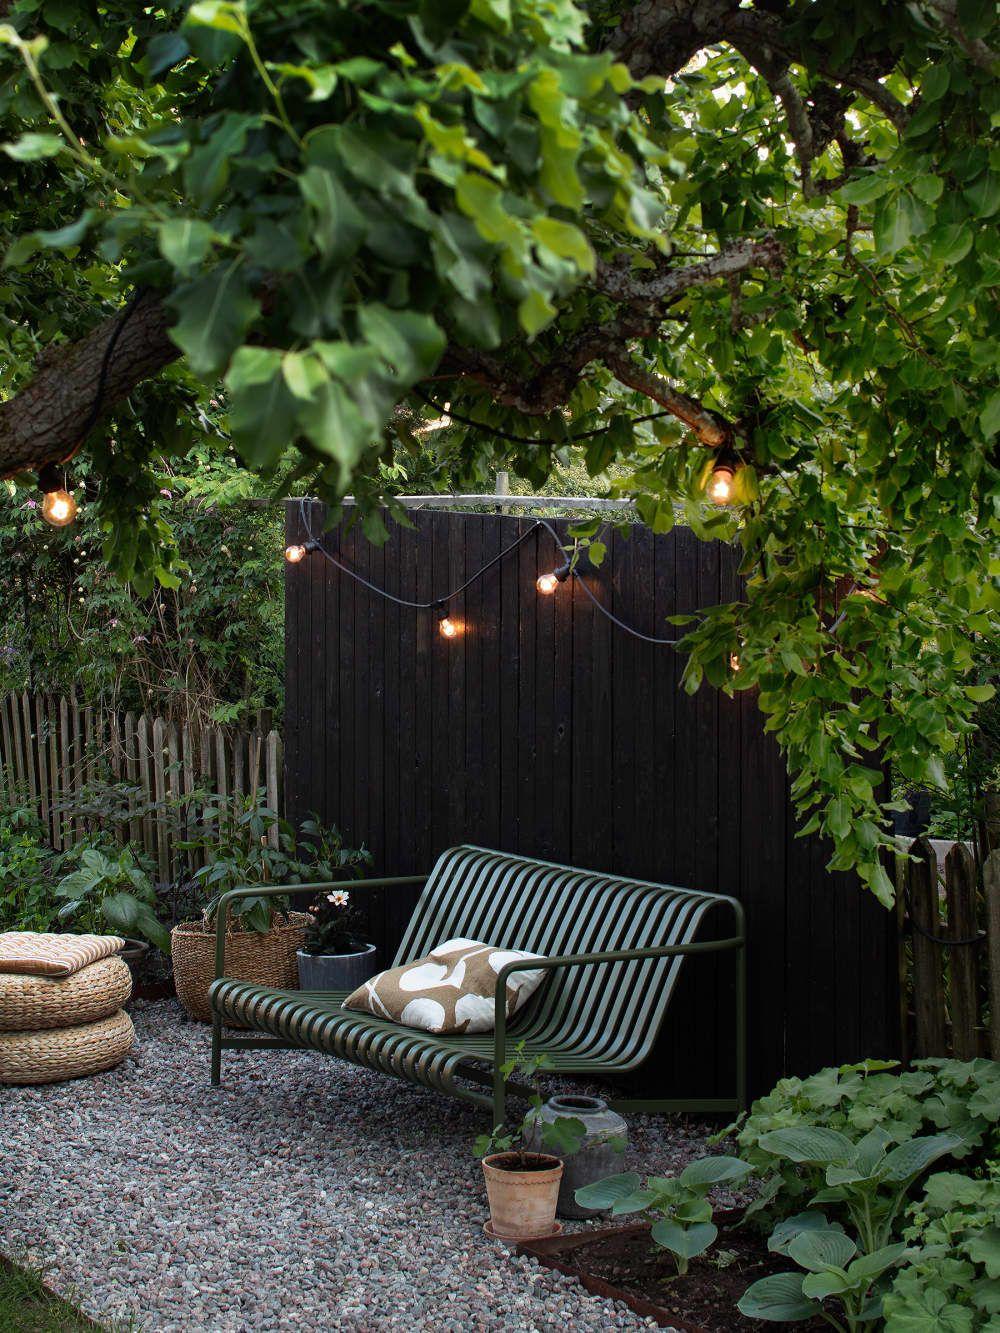 Every Inch Of This Swedish Home Is Full Of Scandinavian Design Inspiration Scandinavian Garden Small Garden Landscape Outdoor Garden Lighting